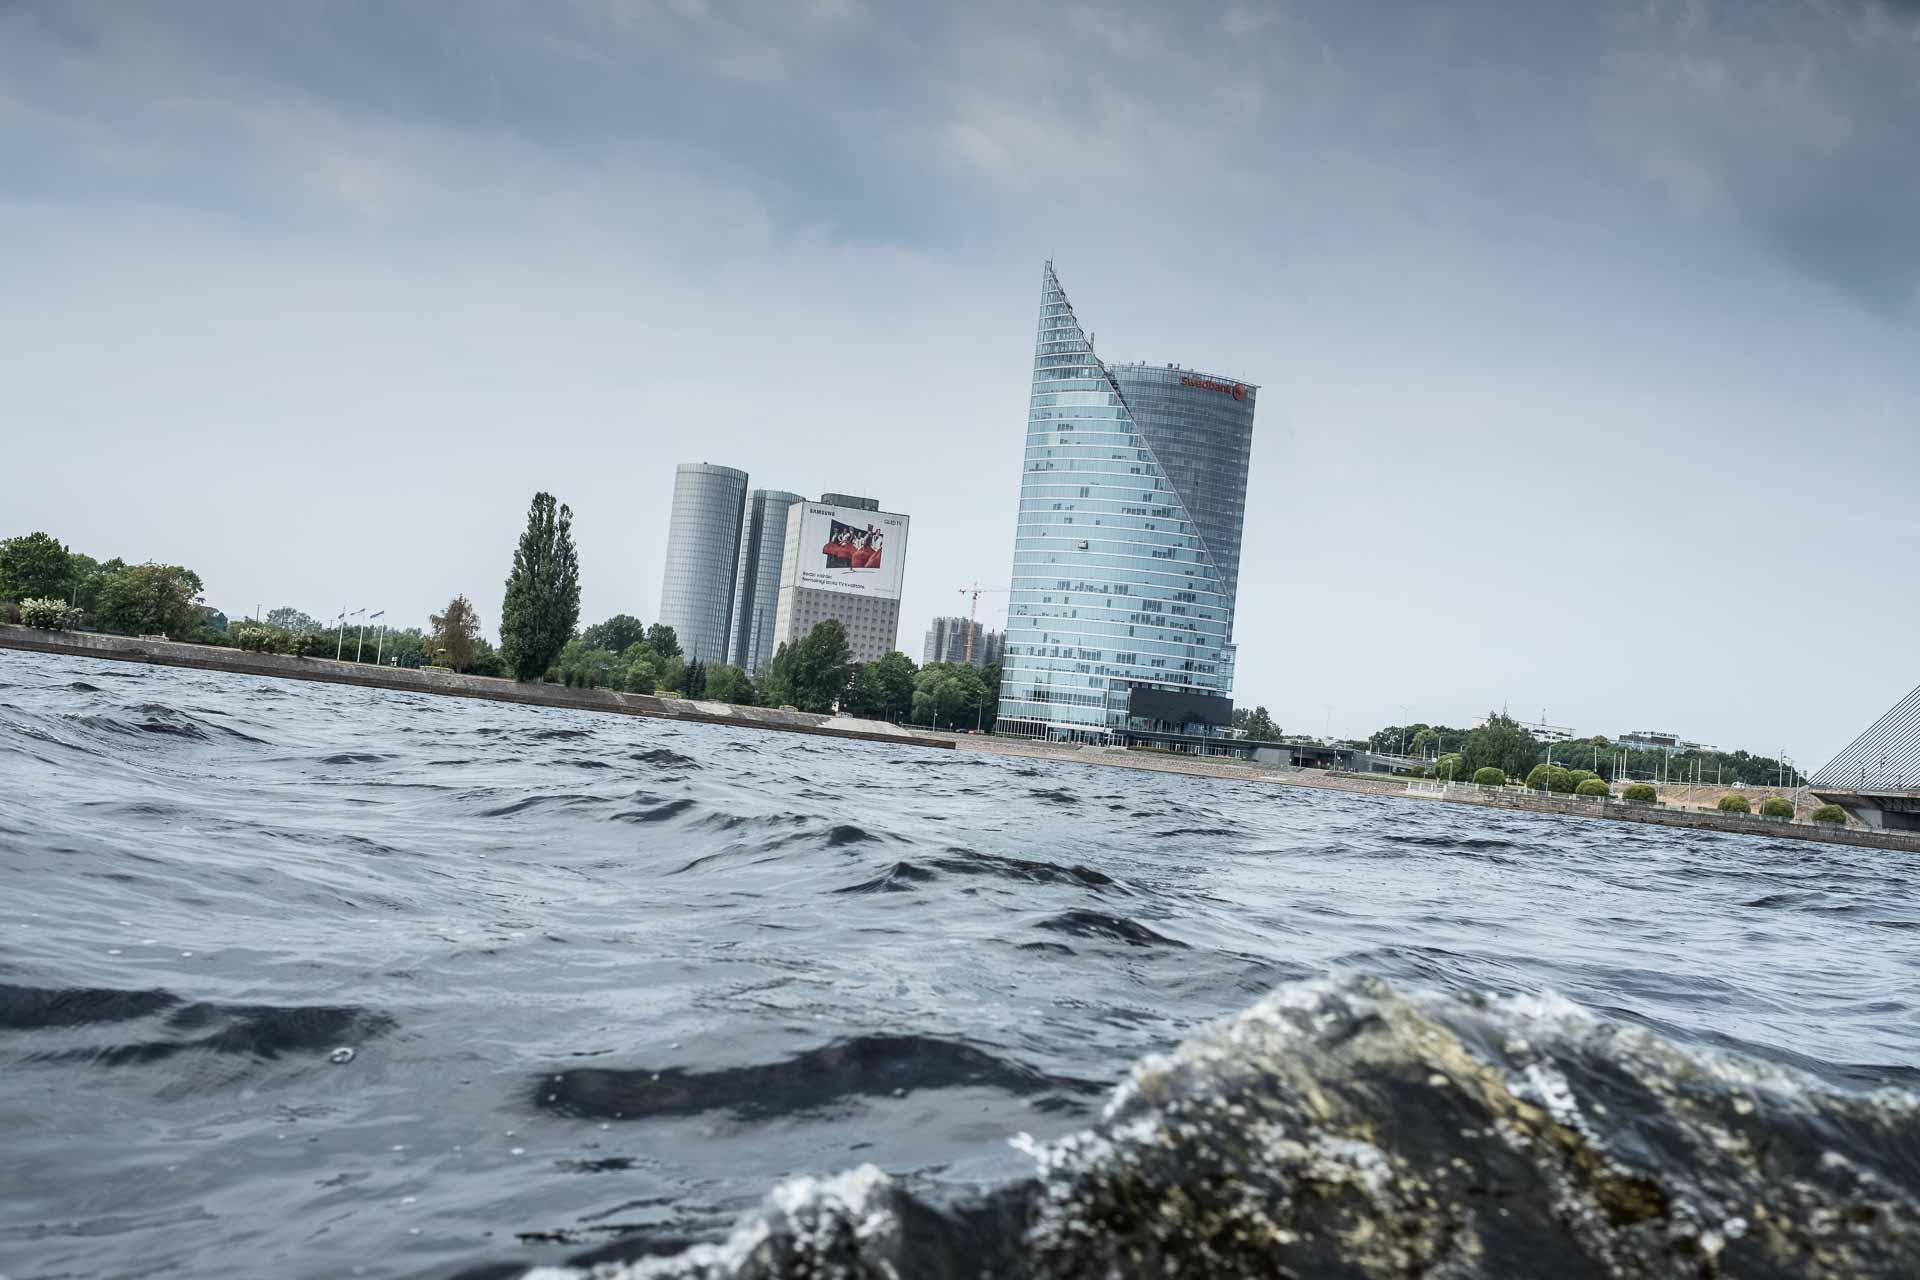 vpPHOTOGRAPHY-20180618-Riga-002